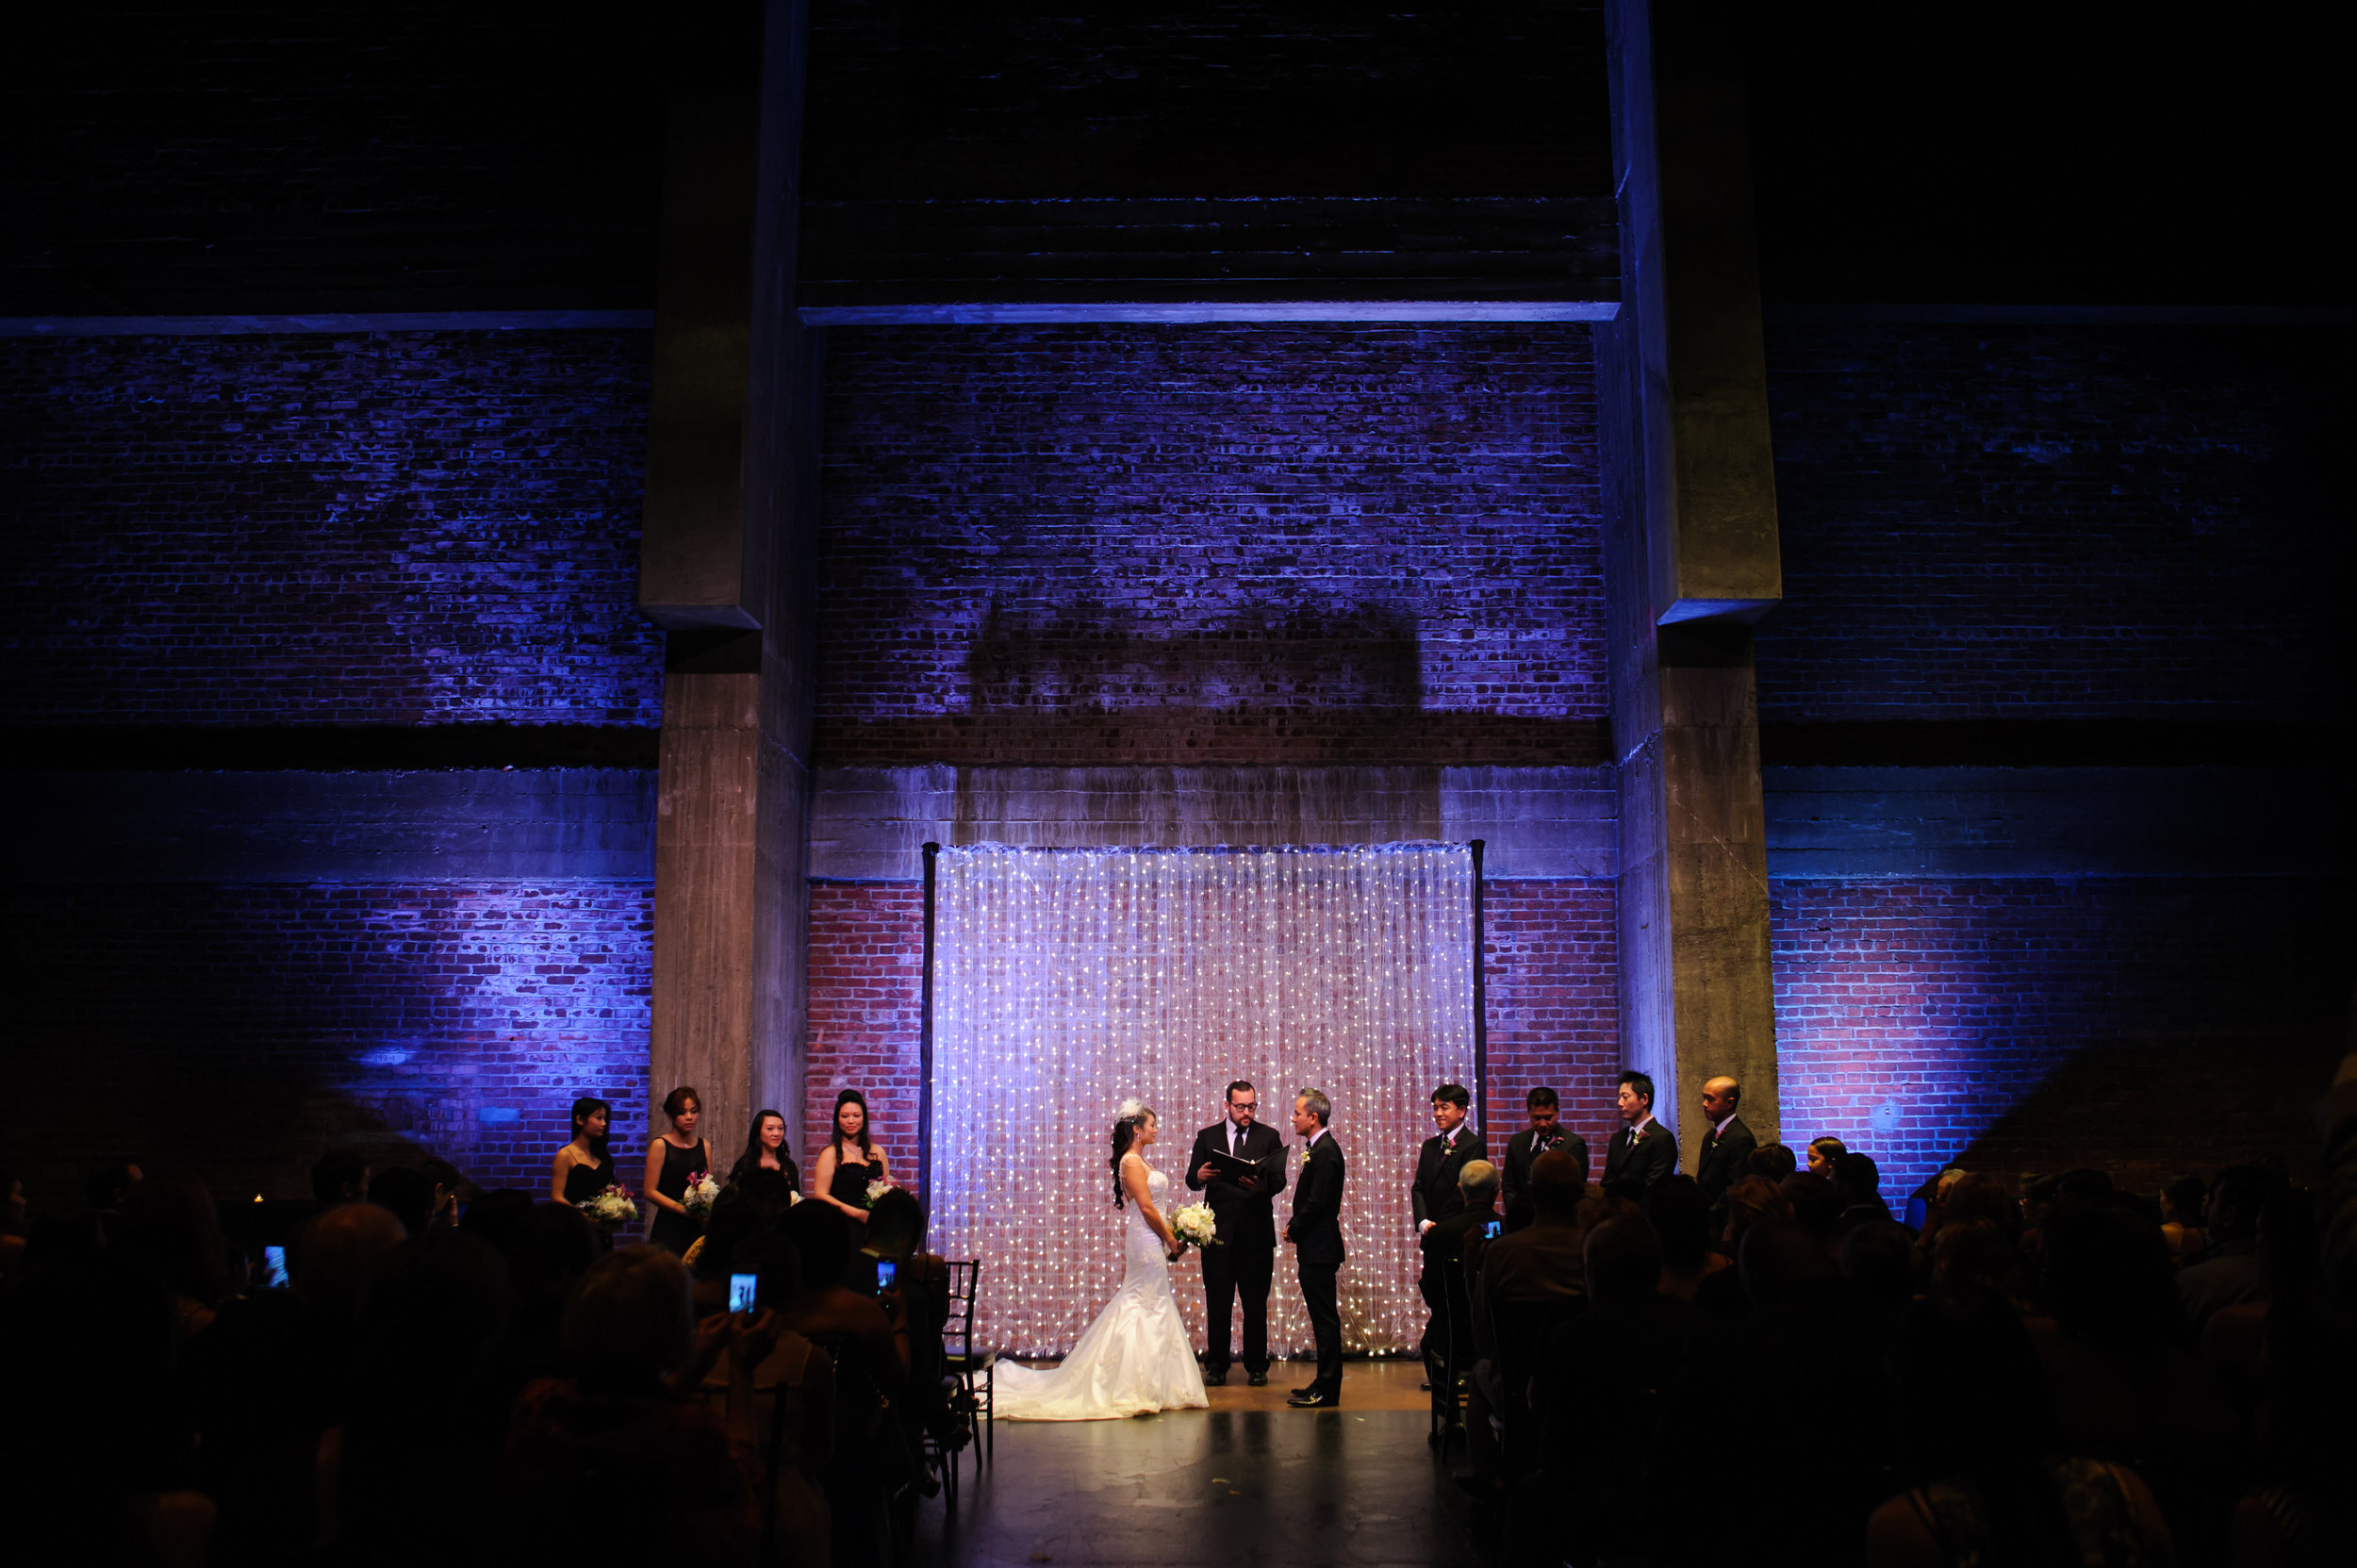 camilla-thuy-093-memorial-auditorium-sacramento-wedding-photographer-katherine-nicole-photography.JPG